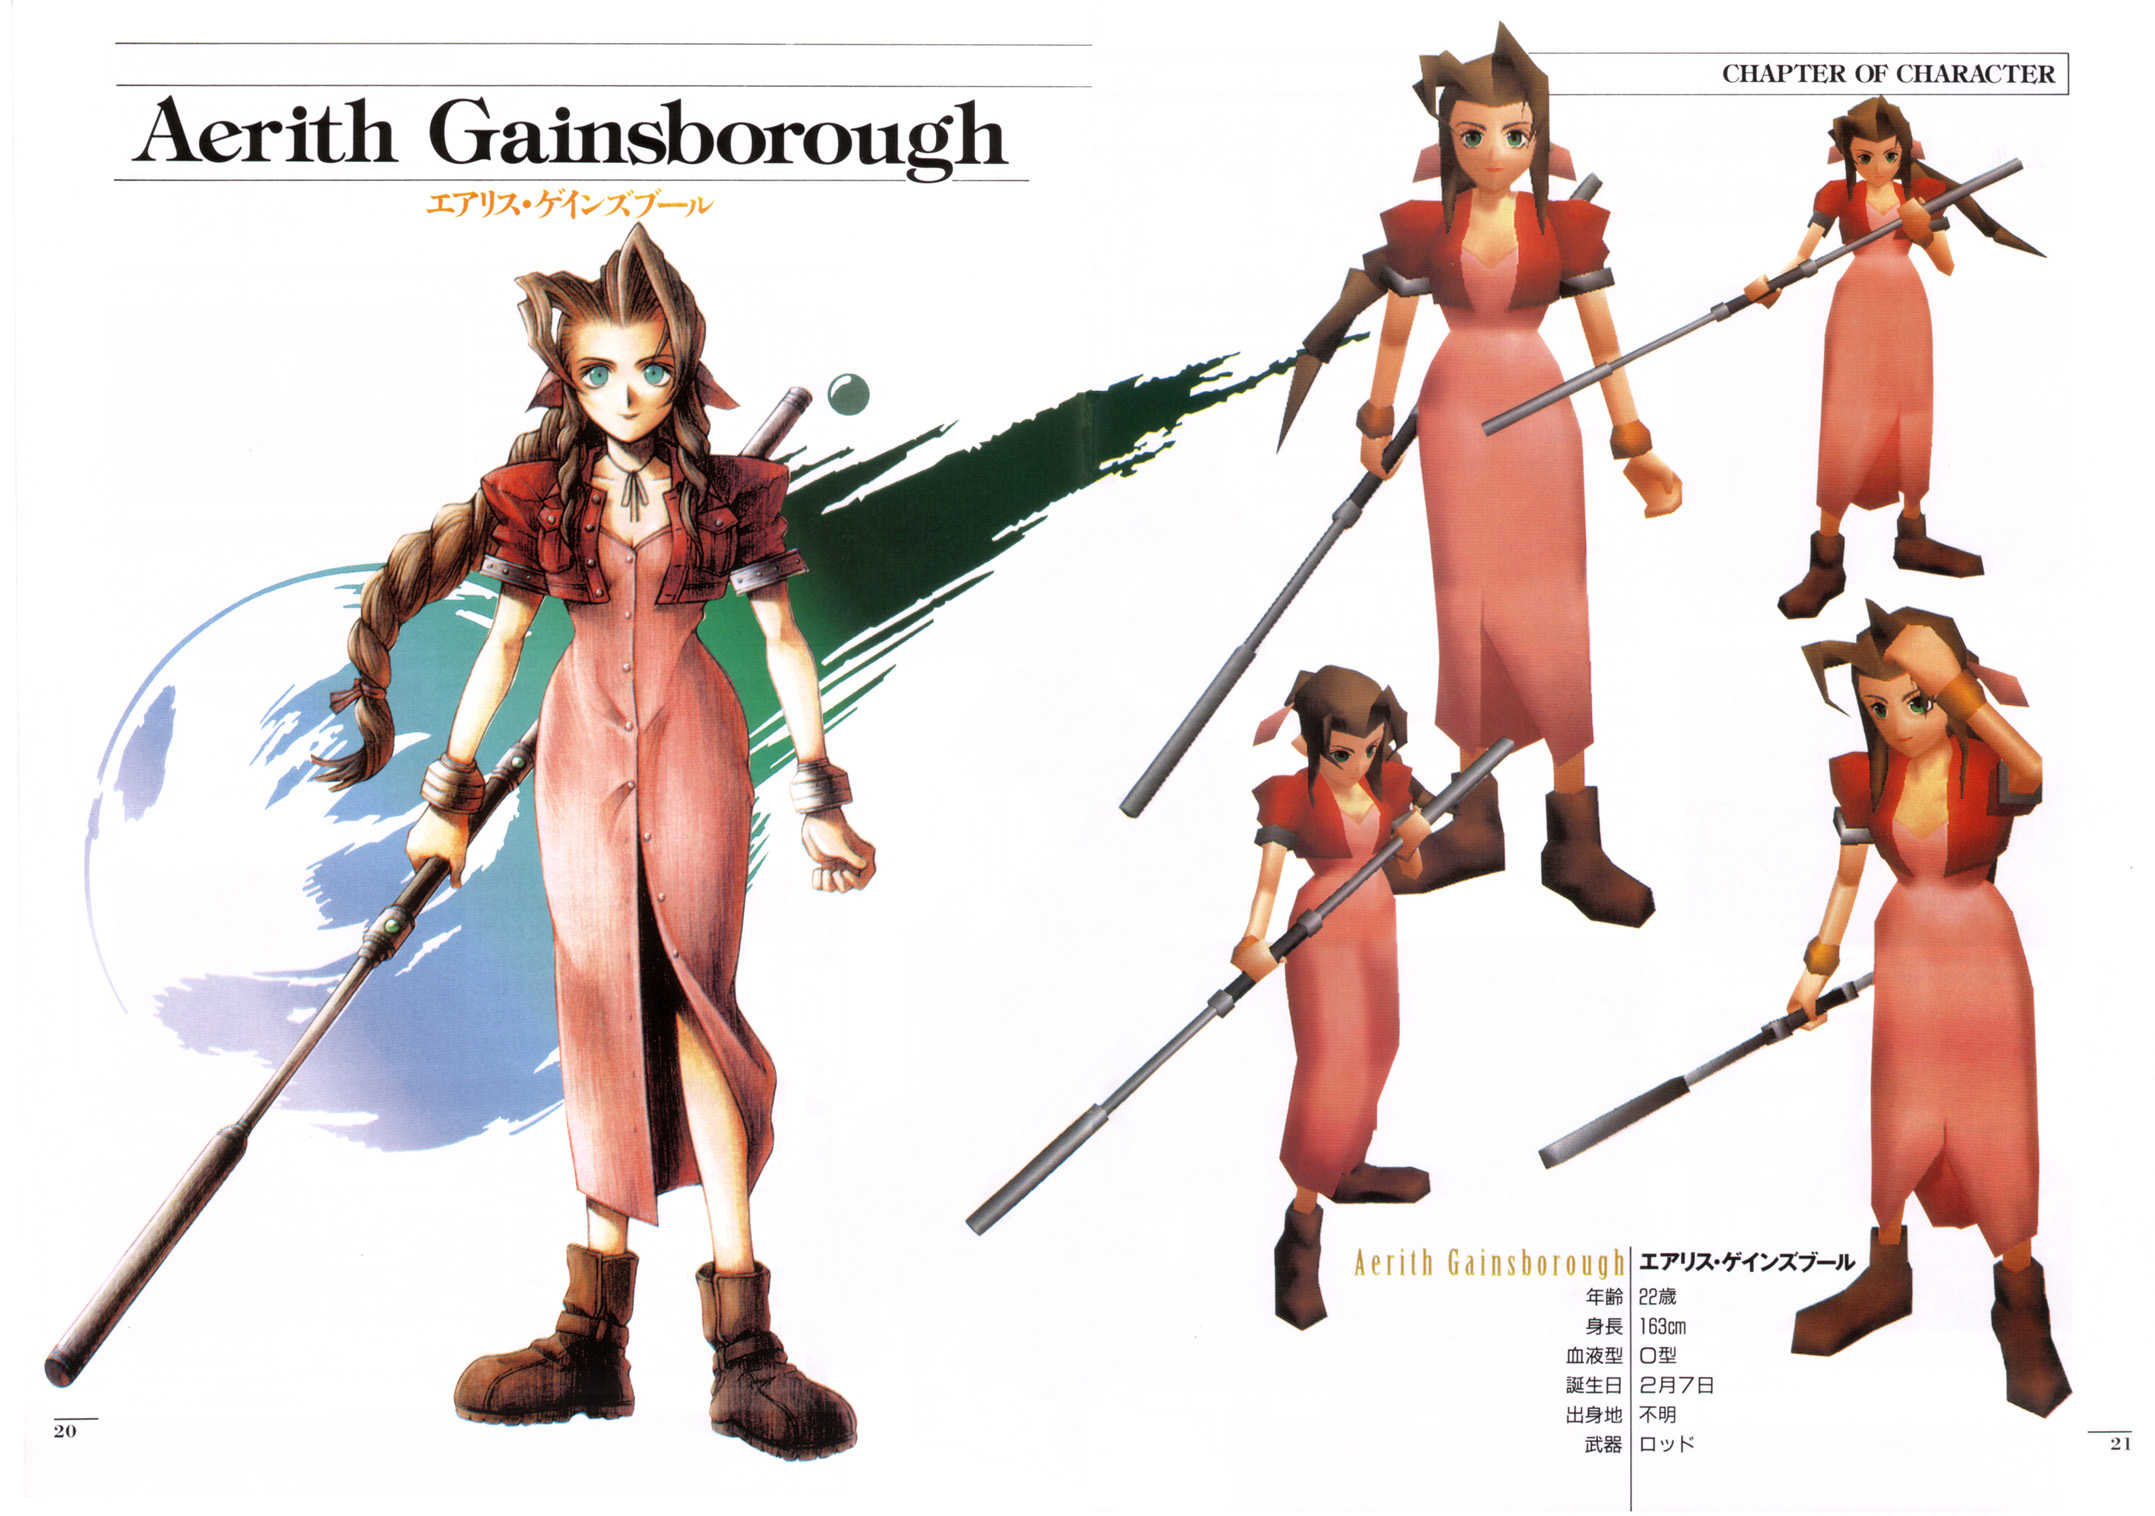 Final Fantasy 7 Anime Characters : Aerith gainsborough final fantasy vii image